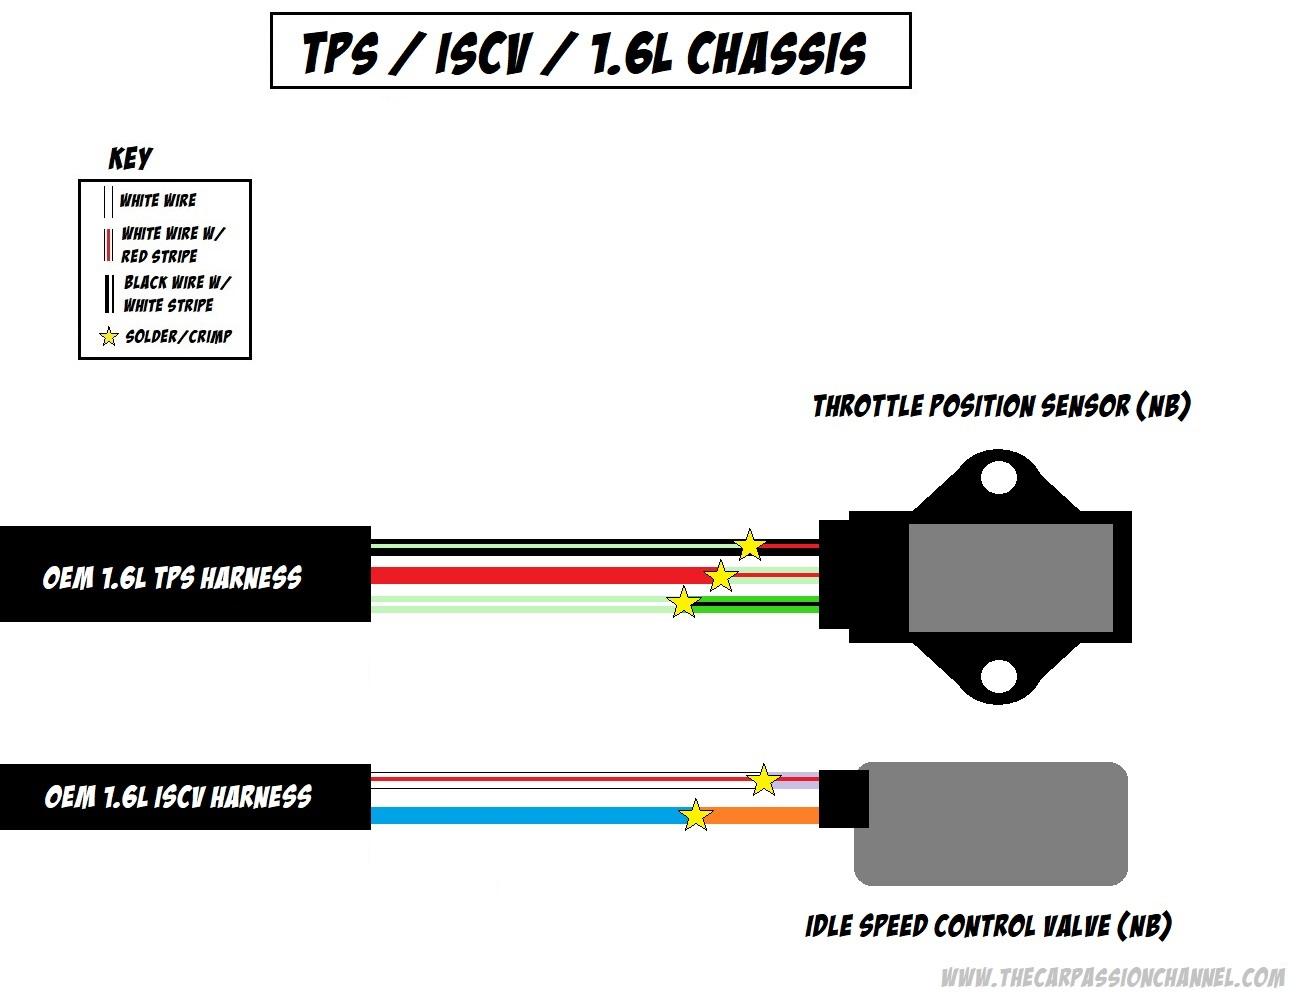 Turbo 400 Transmission Wiring Diagram 747 Wire